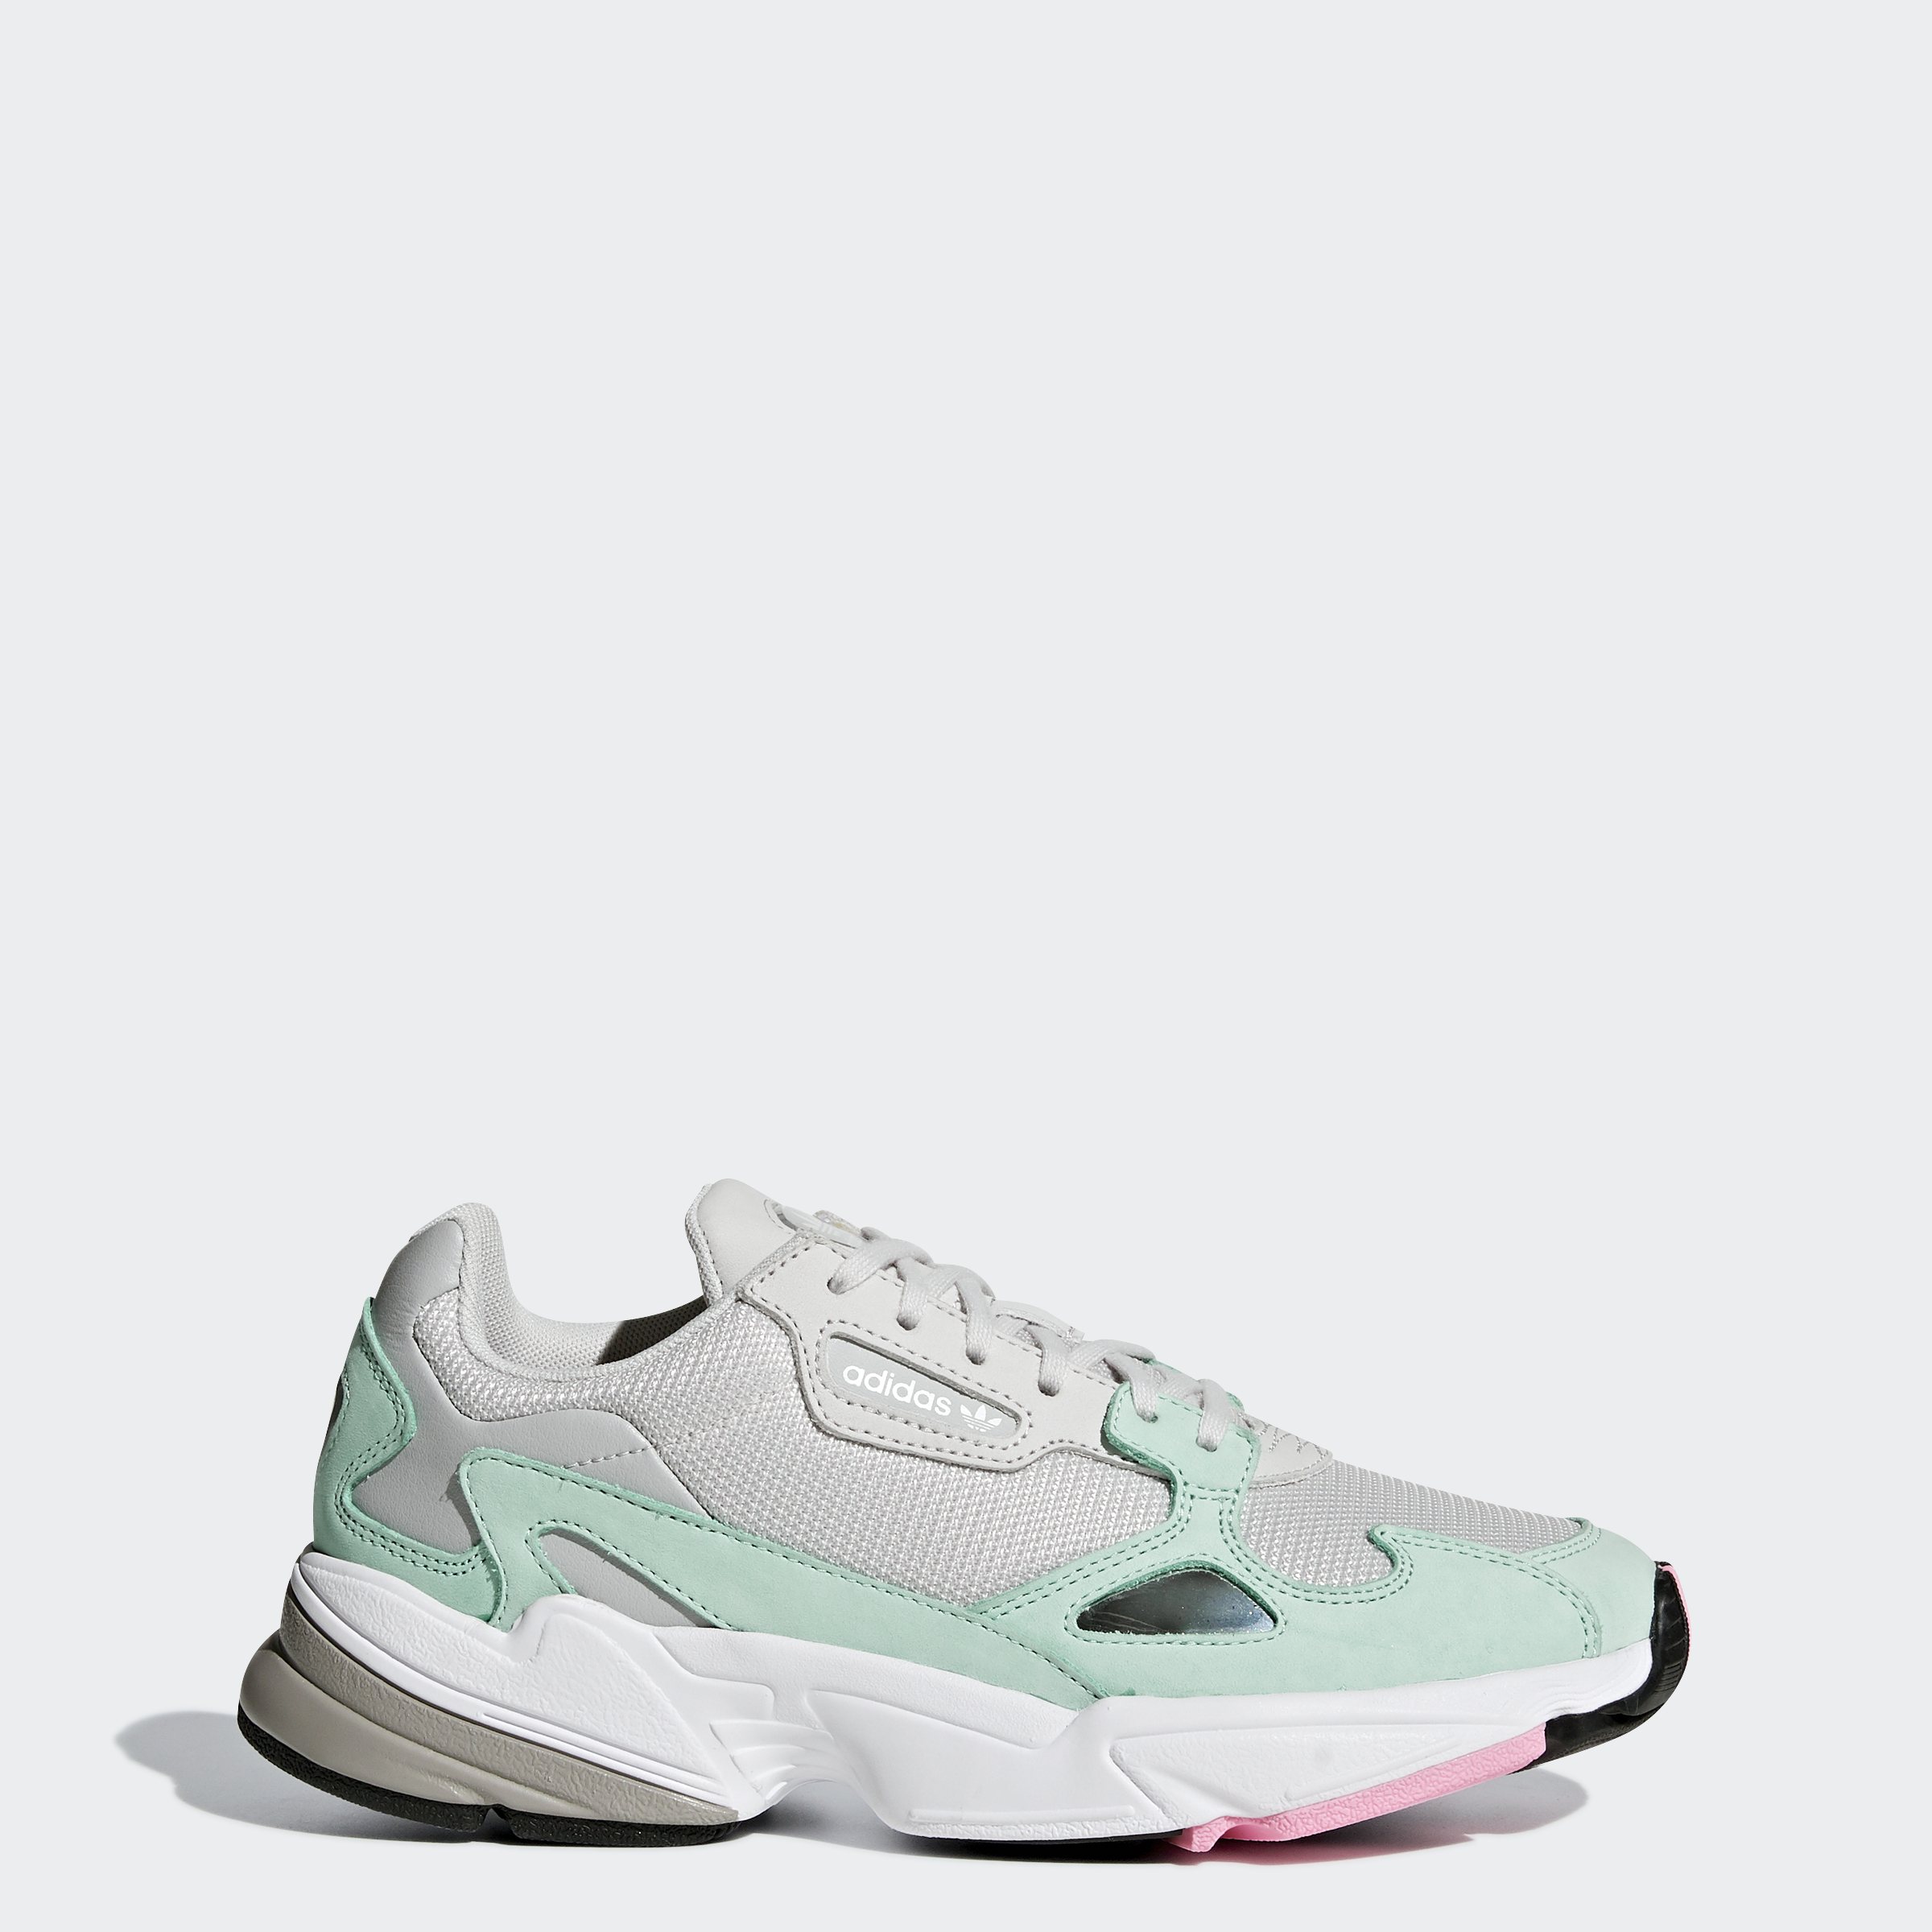 adidas-Originals-Falcon-Shoes-Women-039-s thumbnail 10